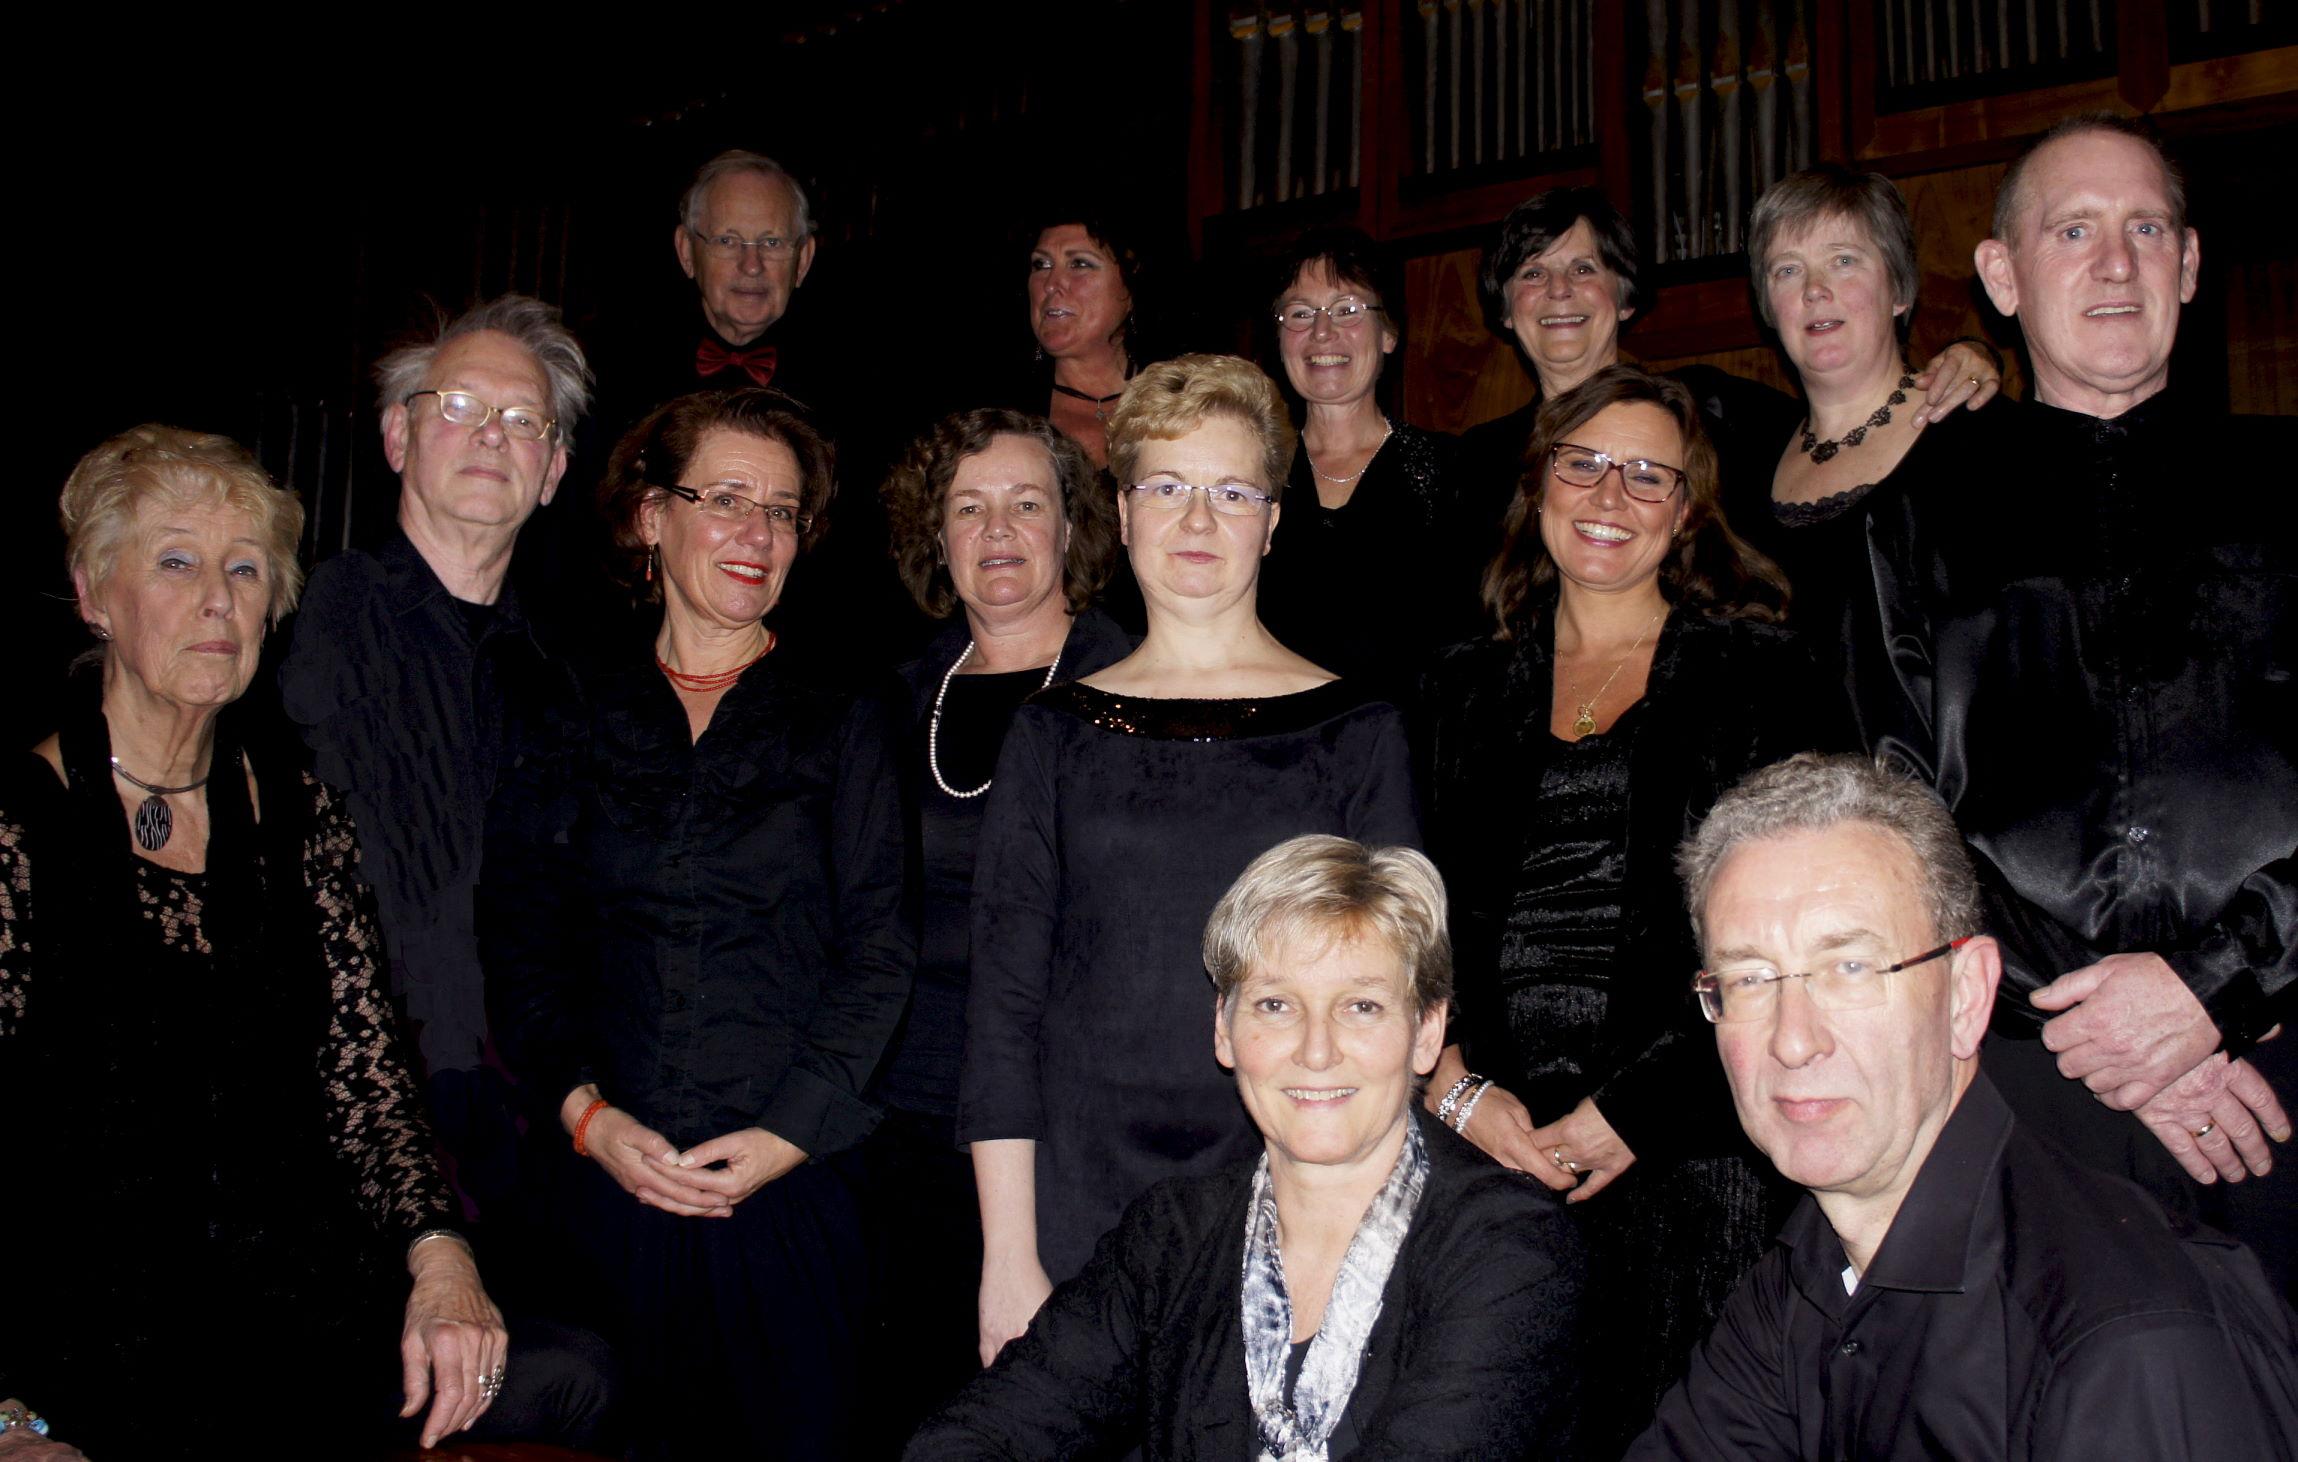 Bachfreunde trudy groep Doelen